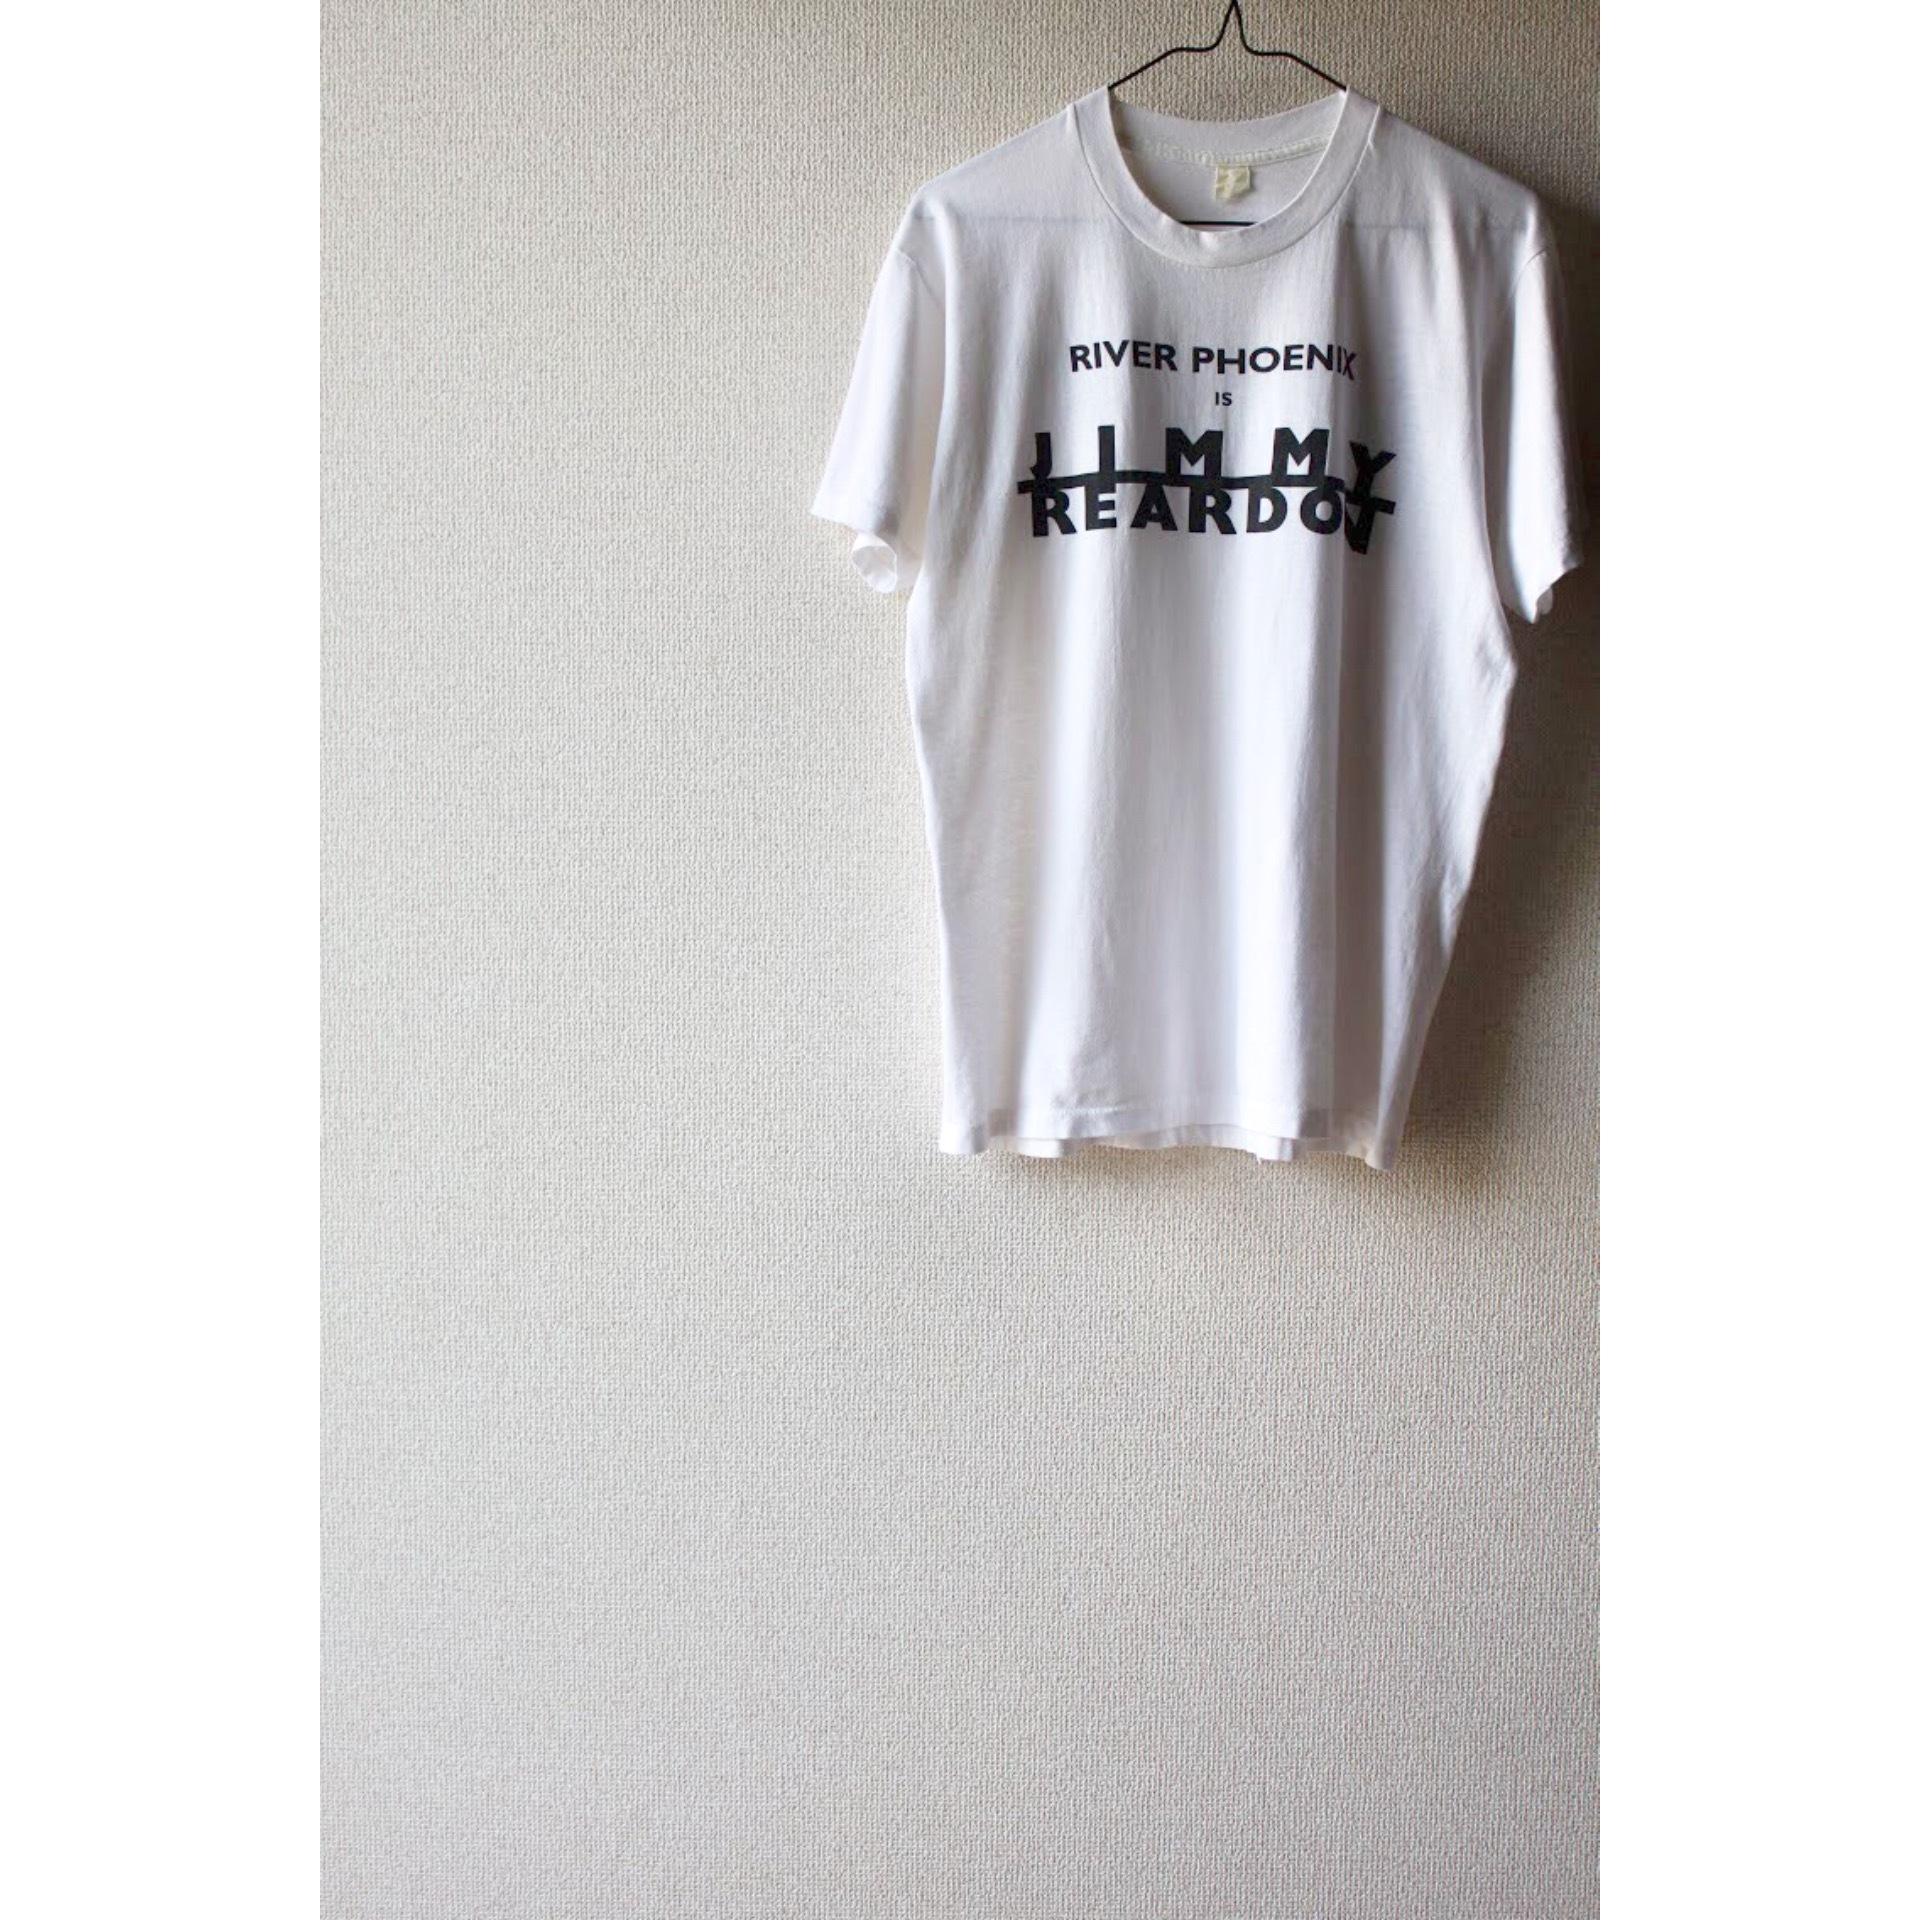 Vintage Jimmy Reardon t shirt